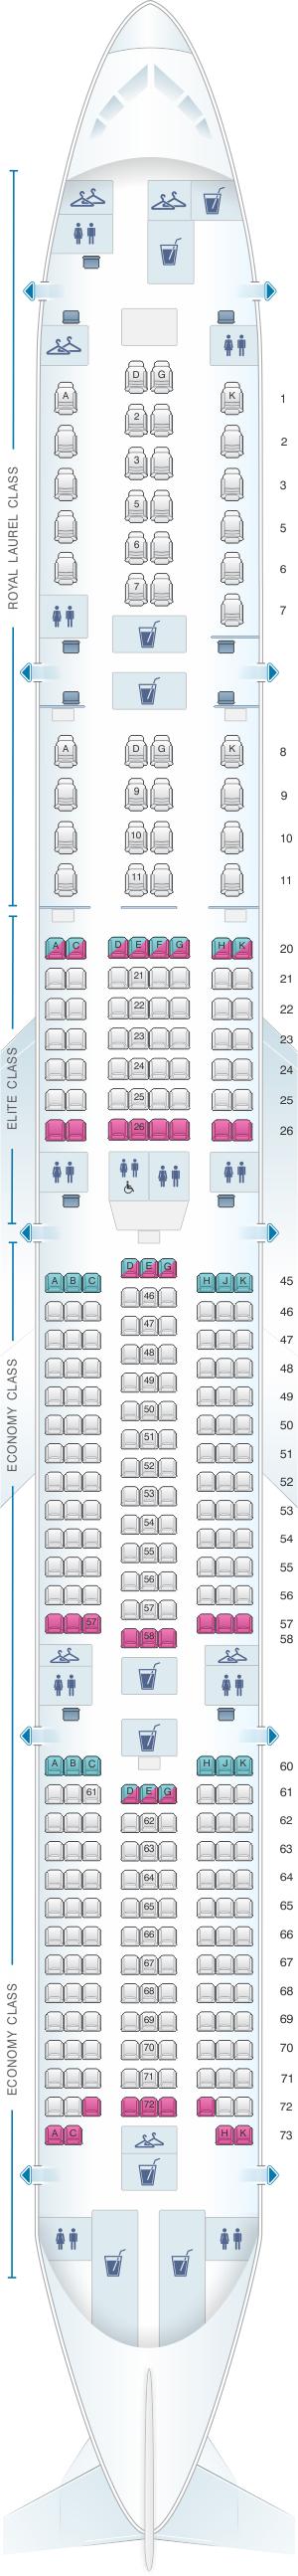 Seat map for EVA Air Boeing B777 300ER 333PAX